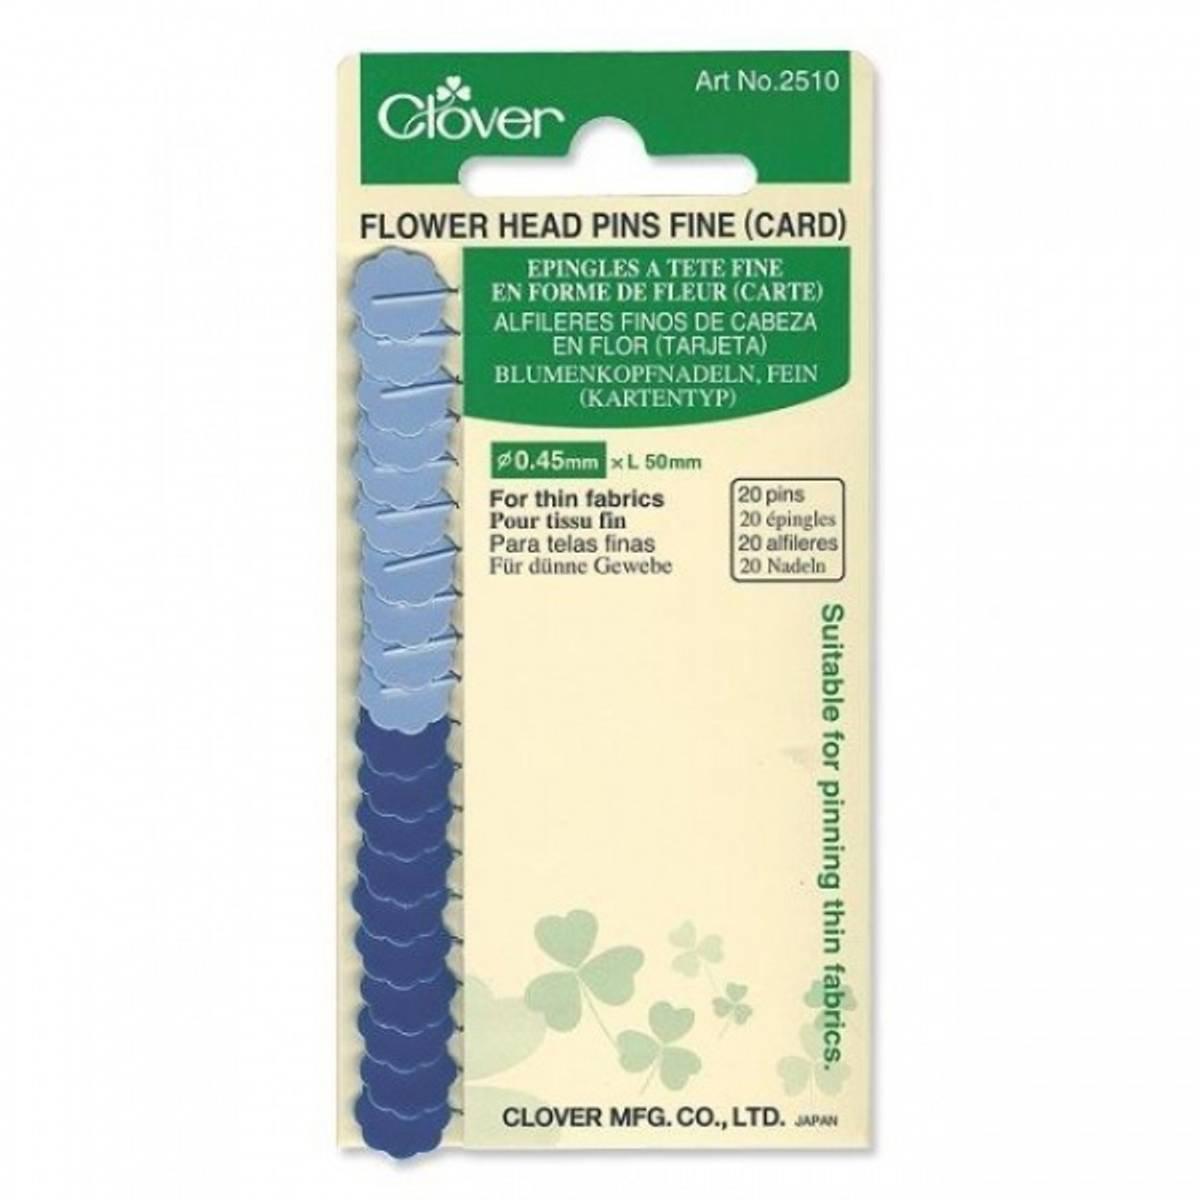 (5) Clover Flower Head Pins Fine 2510